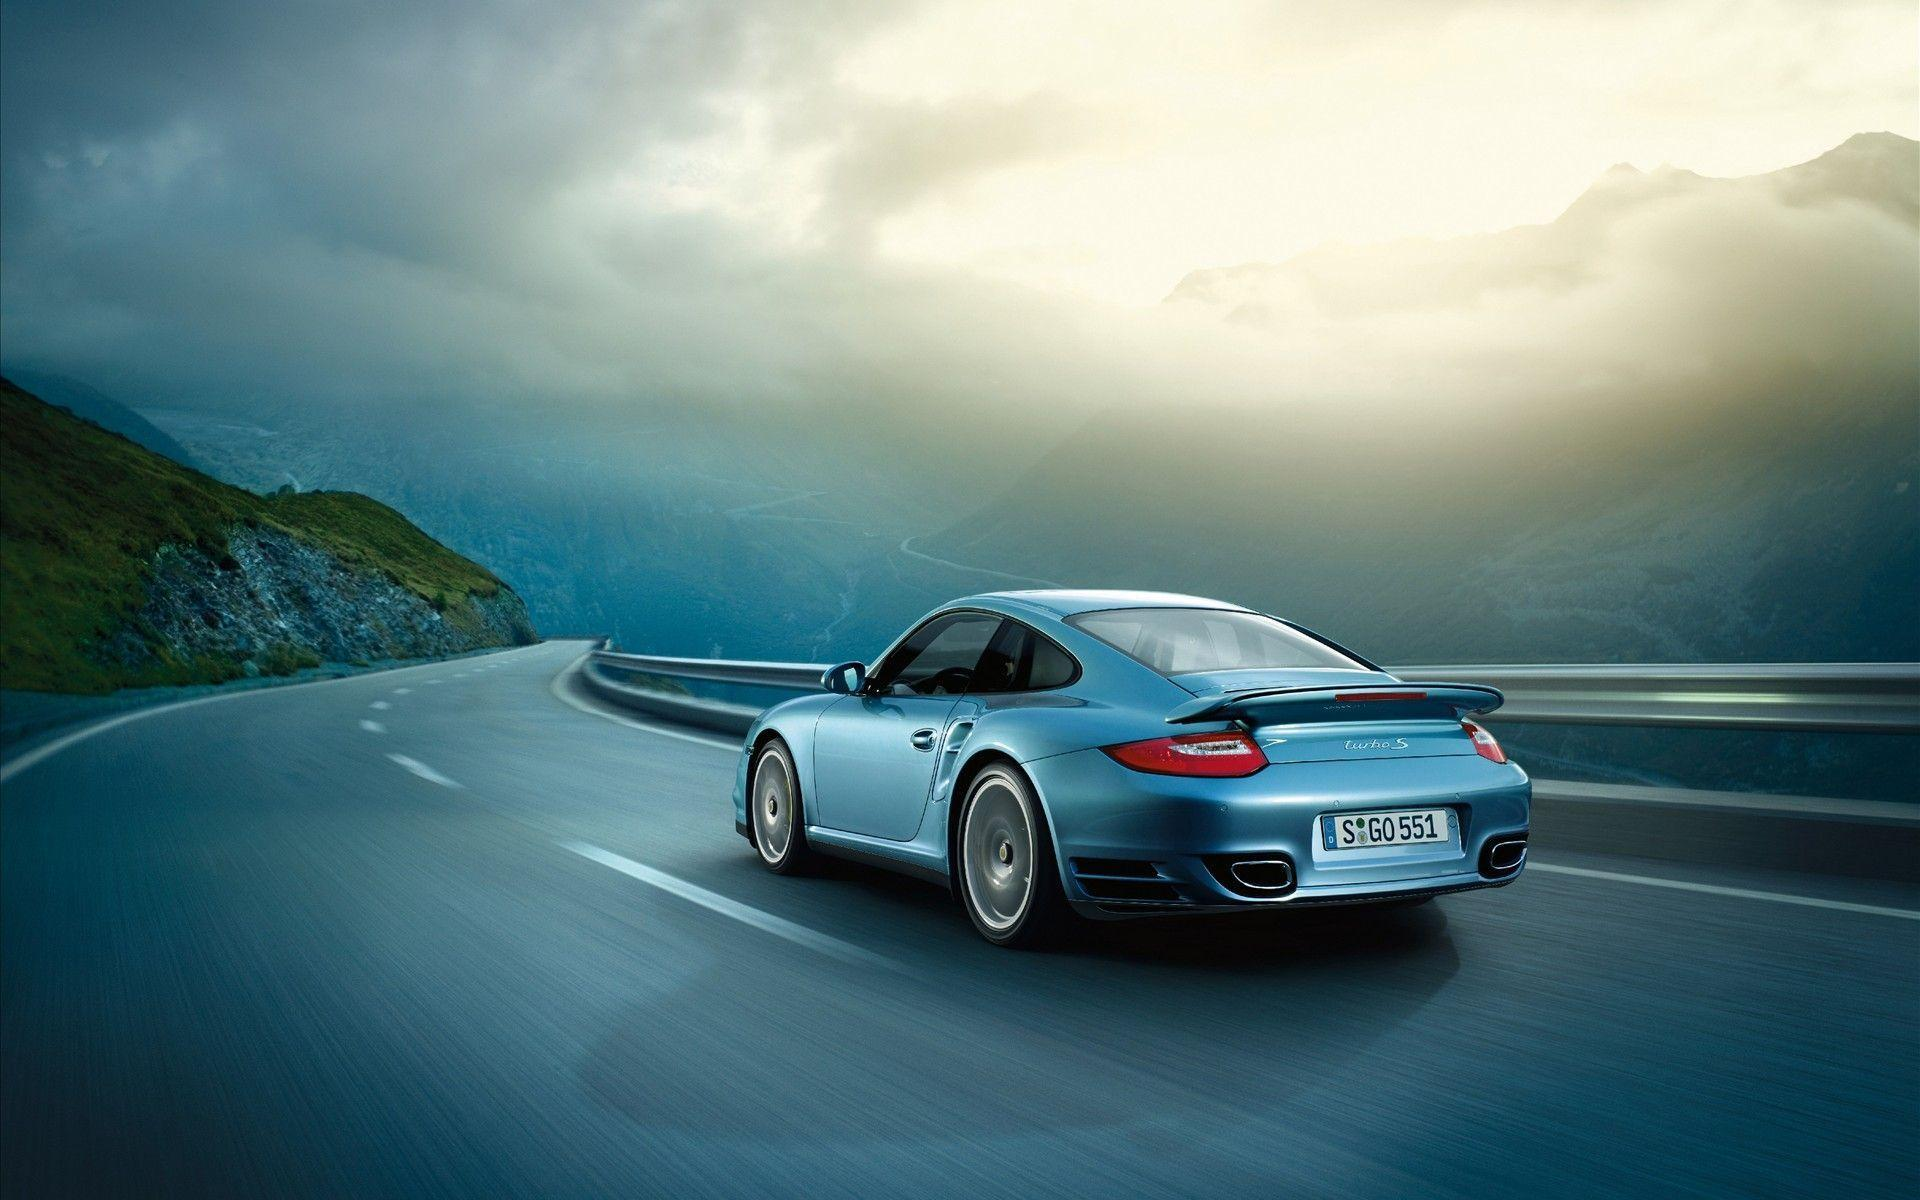 2011 porsche 911 turbo s 2 wallpaper hd car wallpapers